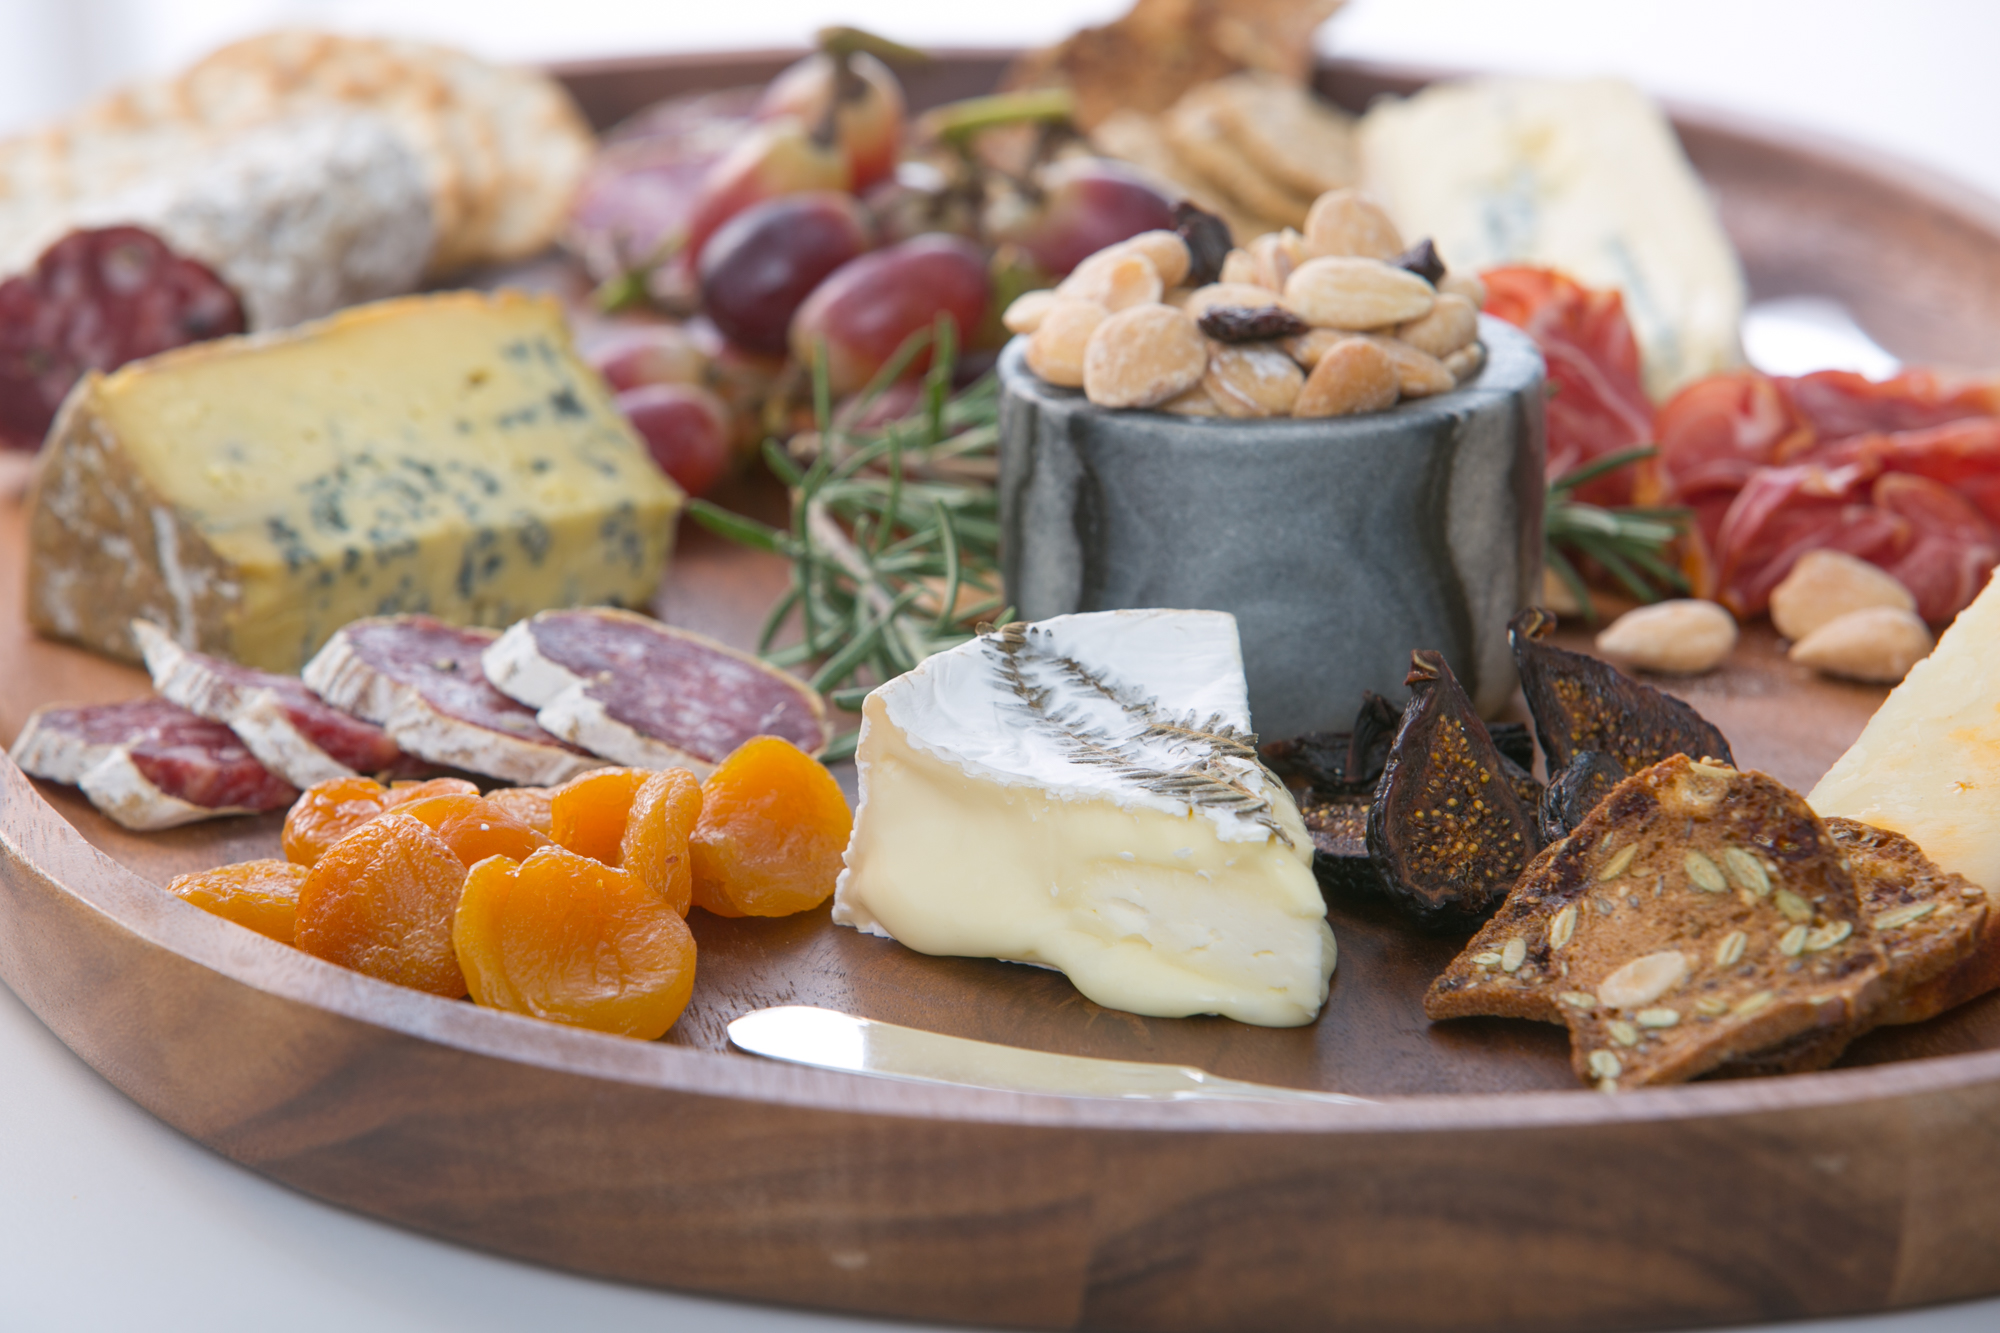 cheese plate no crop.jpg